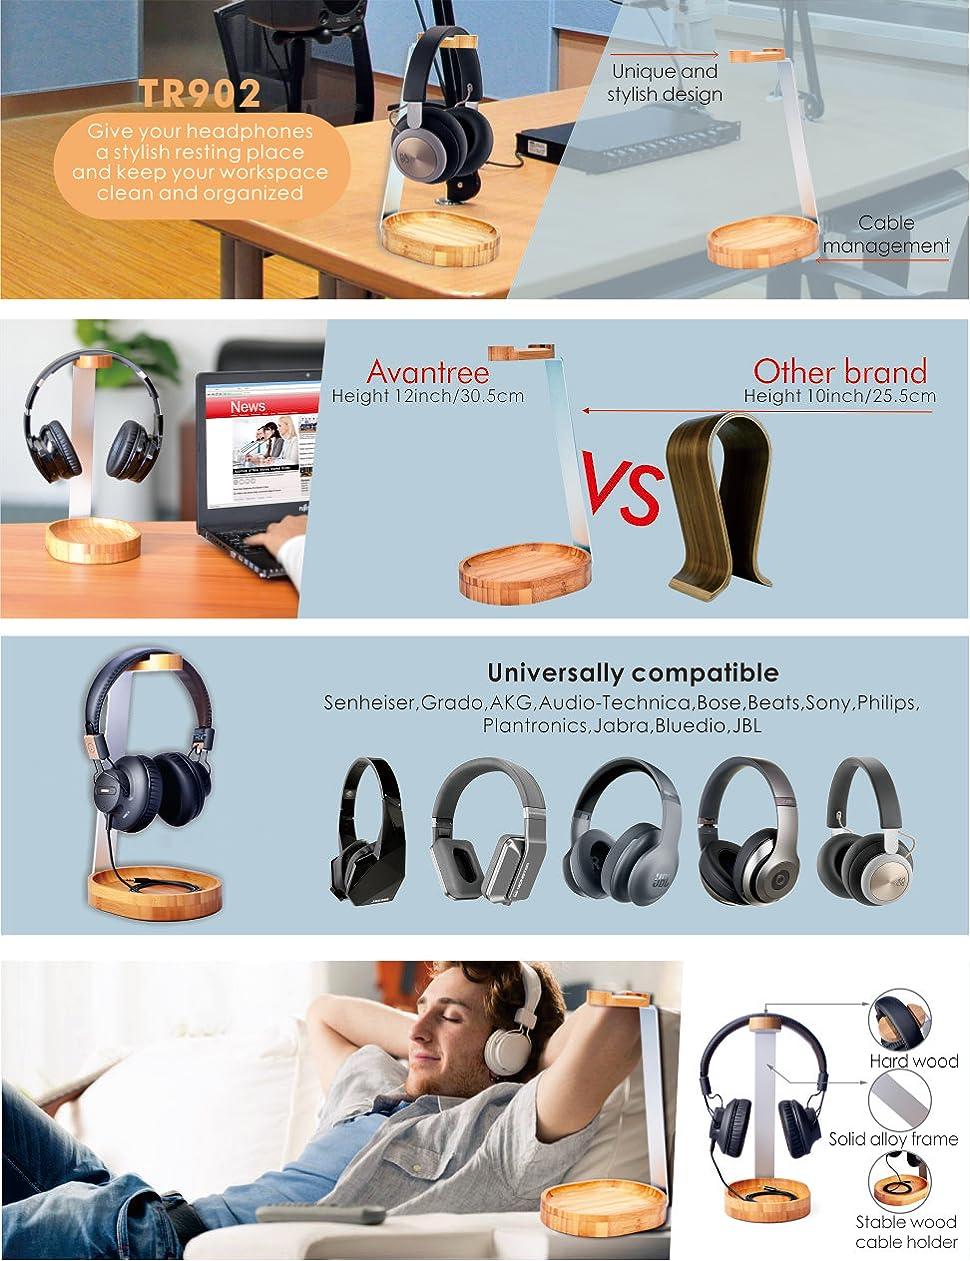 Amazon.com: Avantree Universal Wooden & Aluminum Headphone